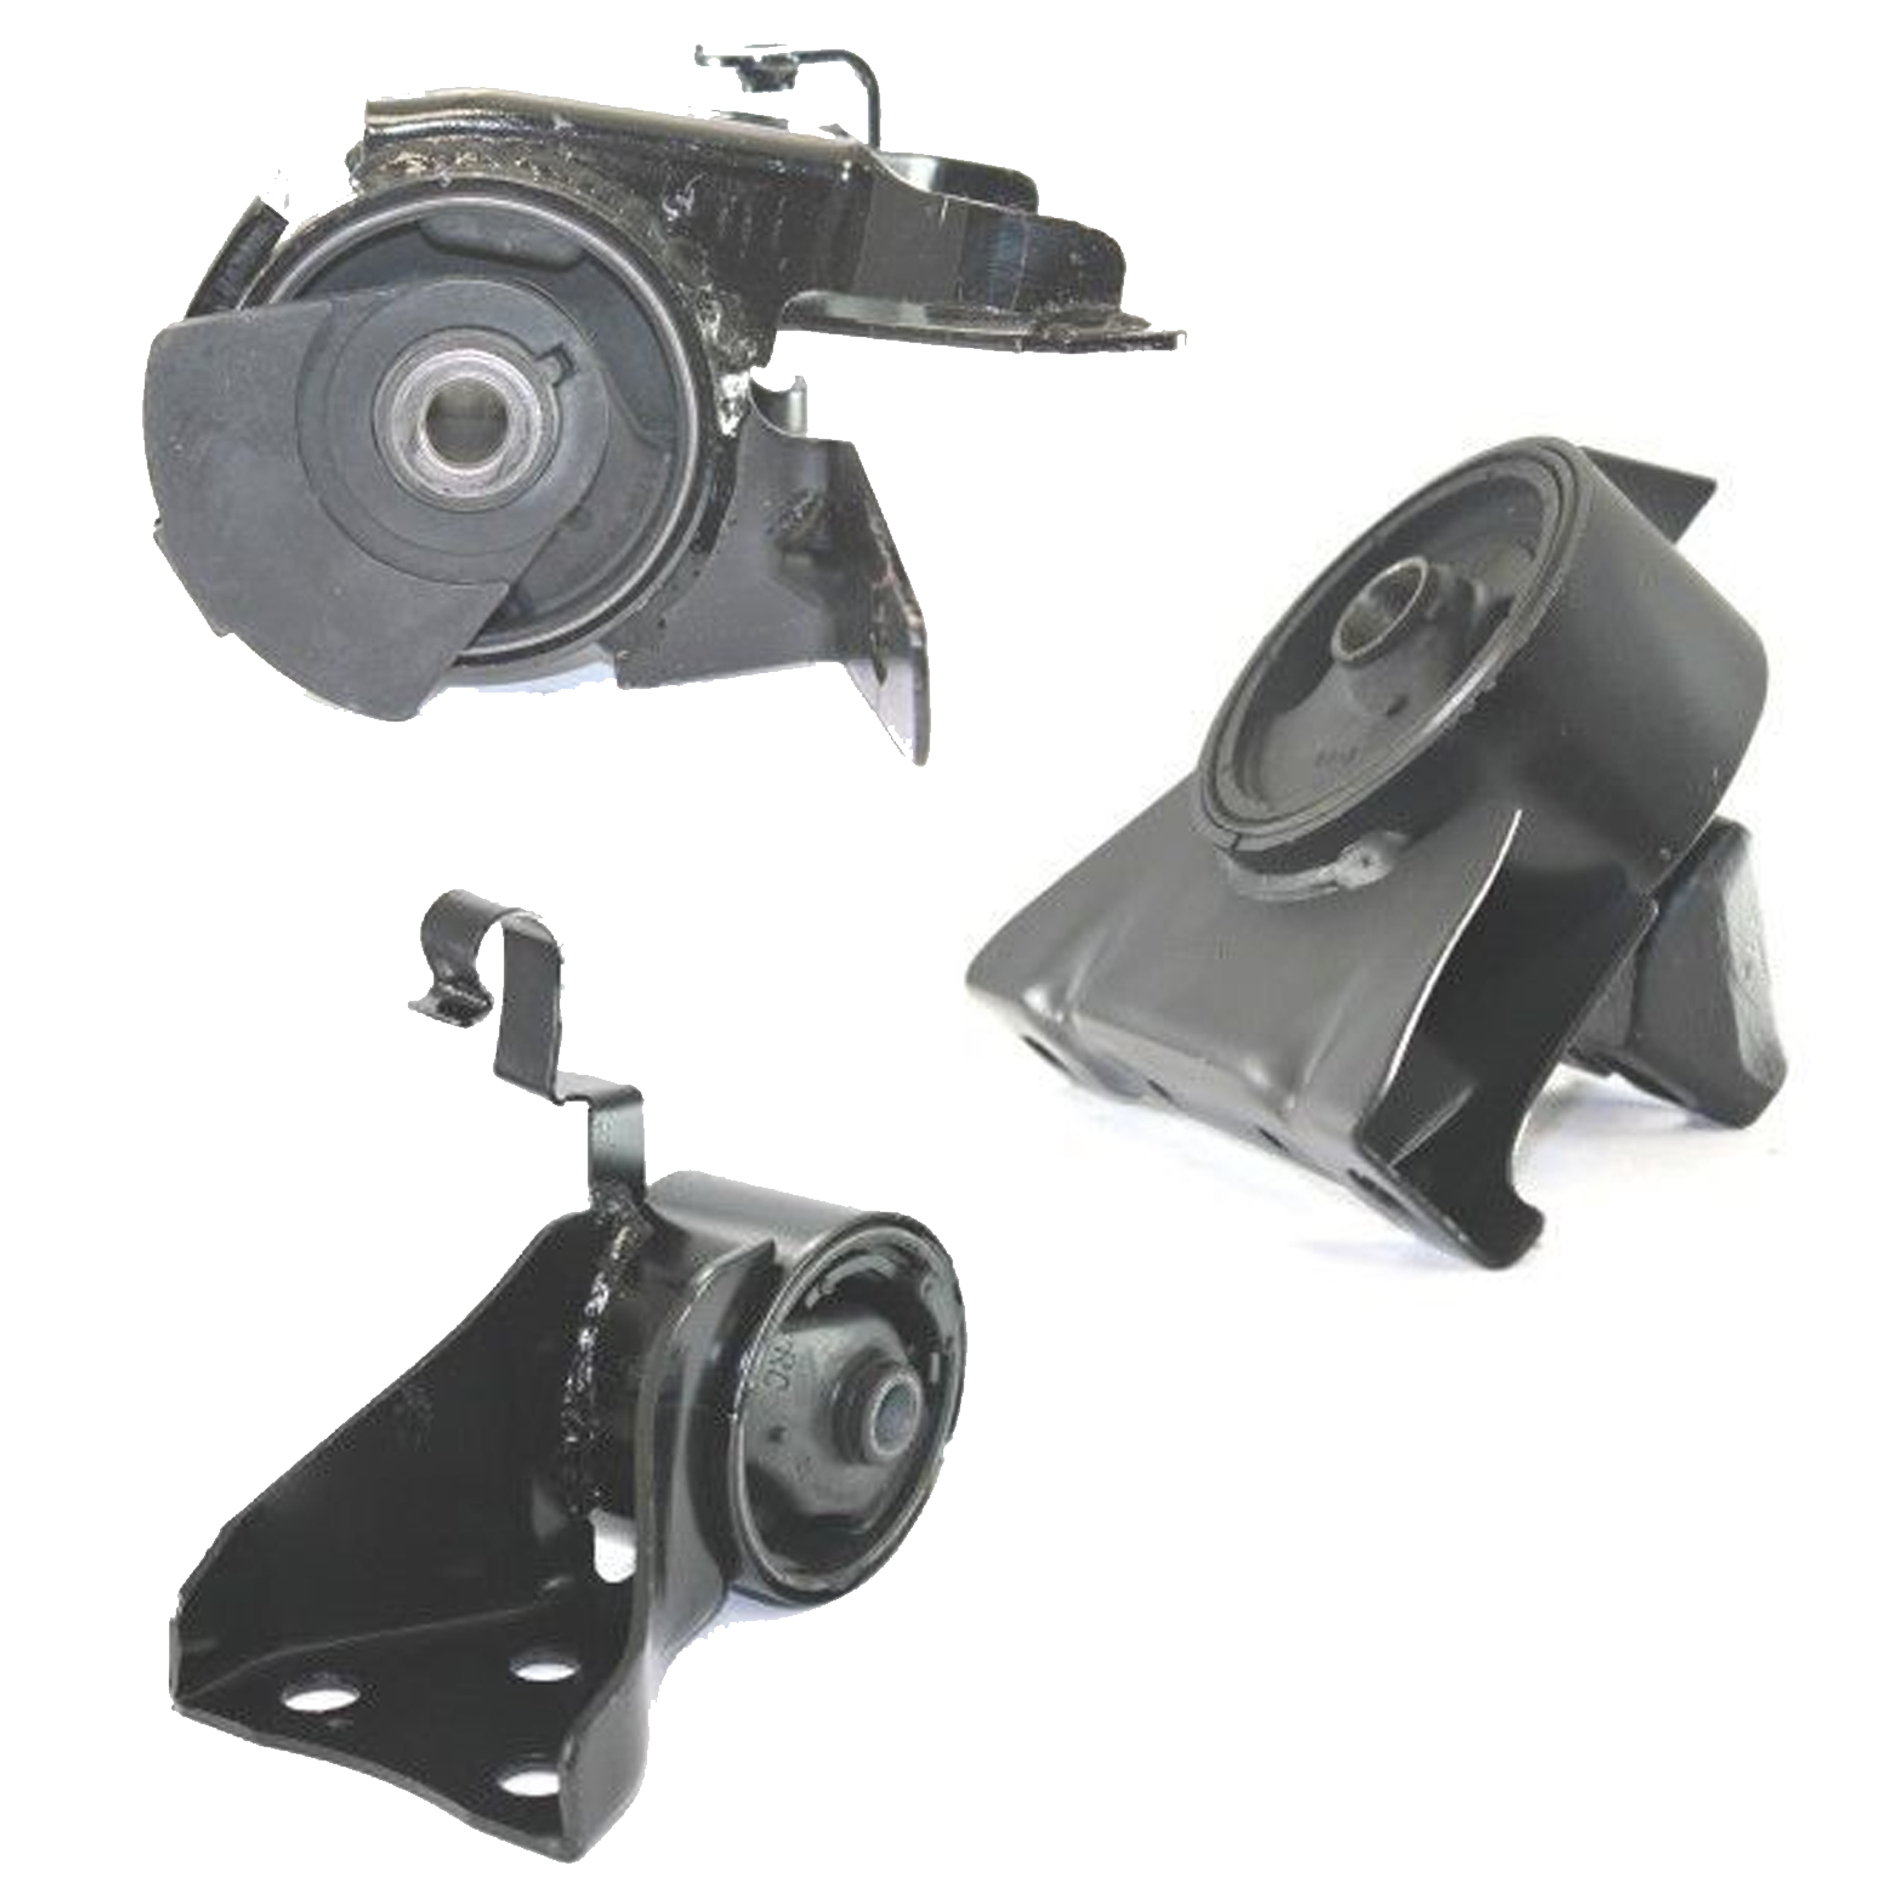 New Rear Engine Motor Mount For Mazda Protege 1.8L 2.0L 6485 A6485